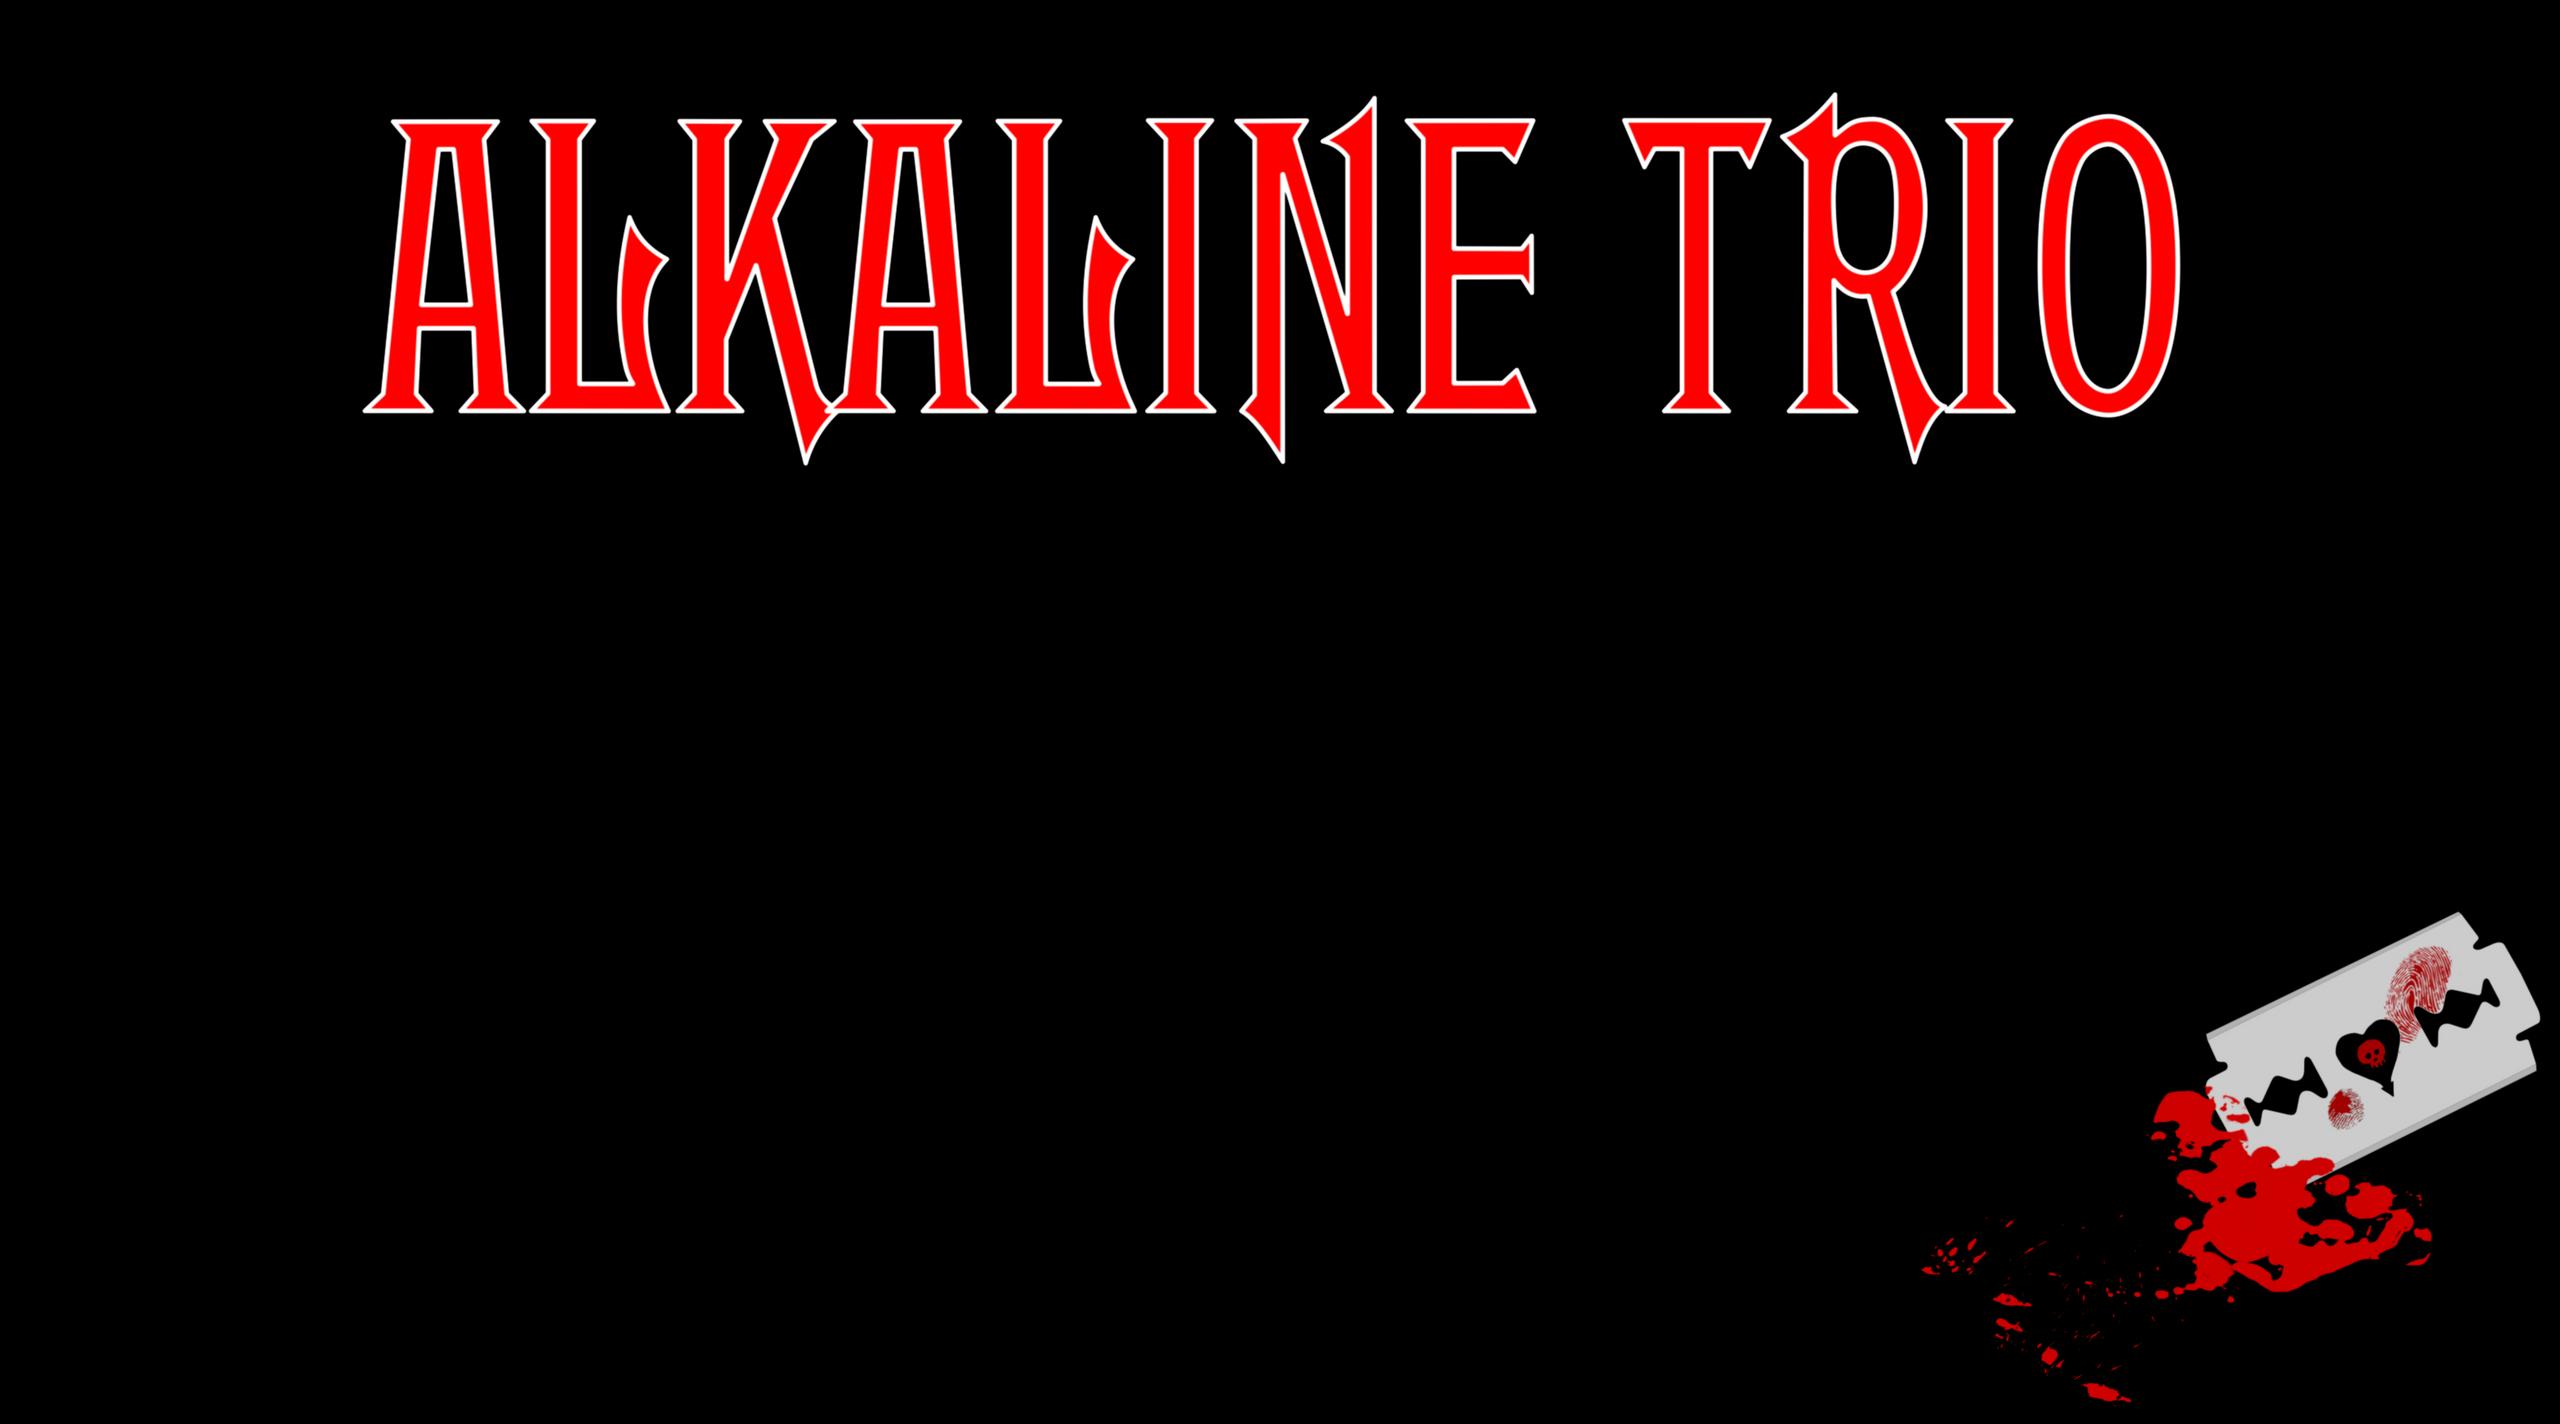 alkaline trio wallpaper